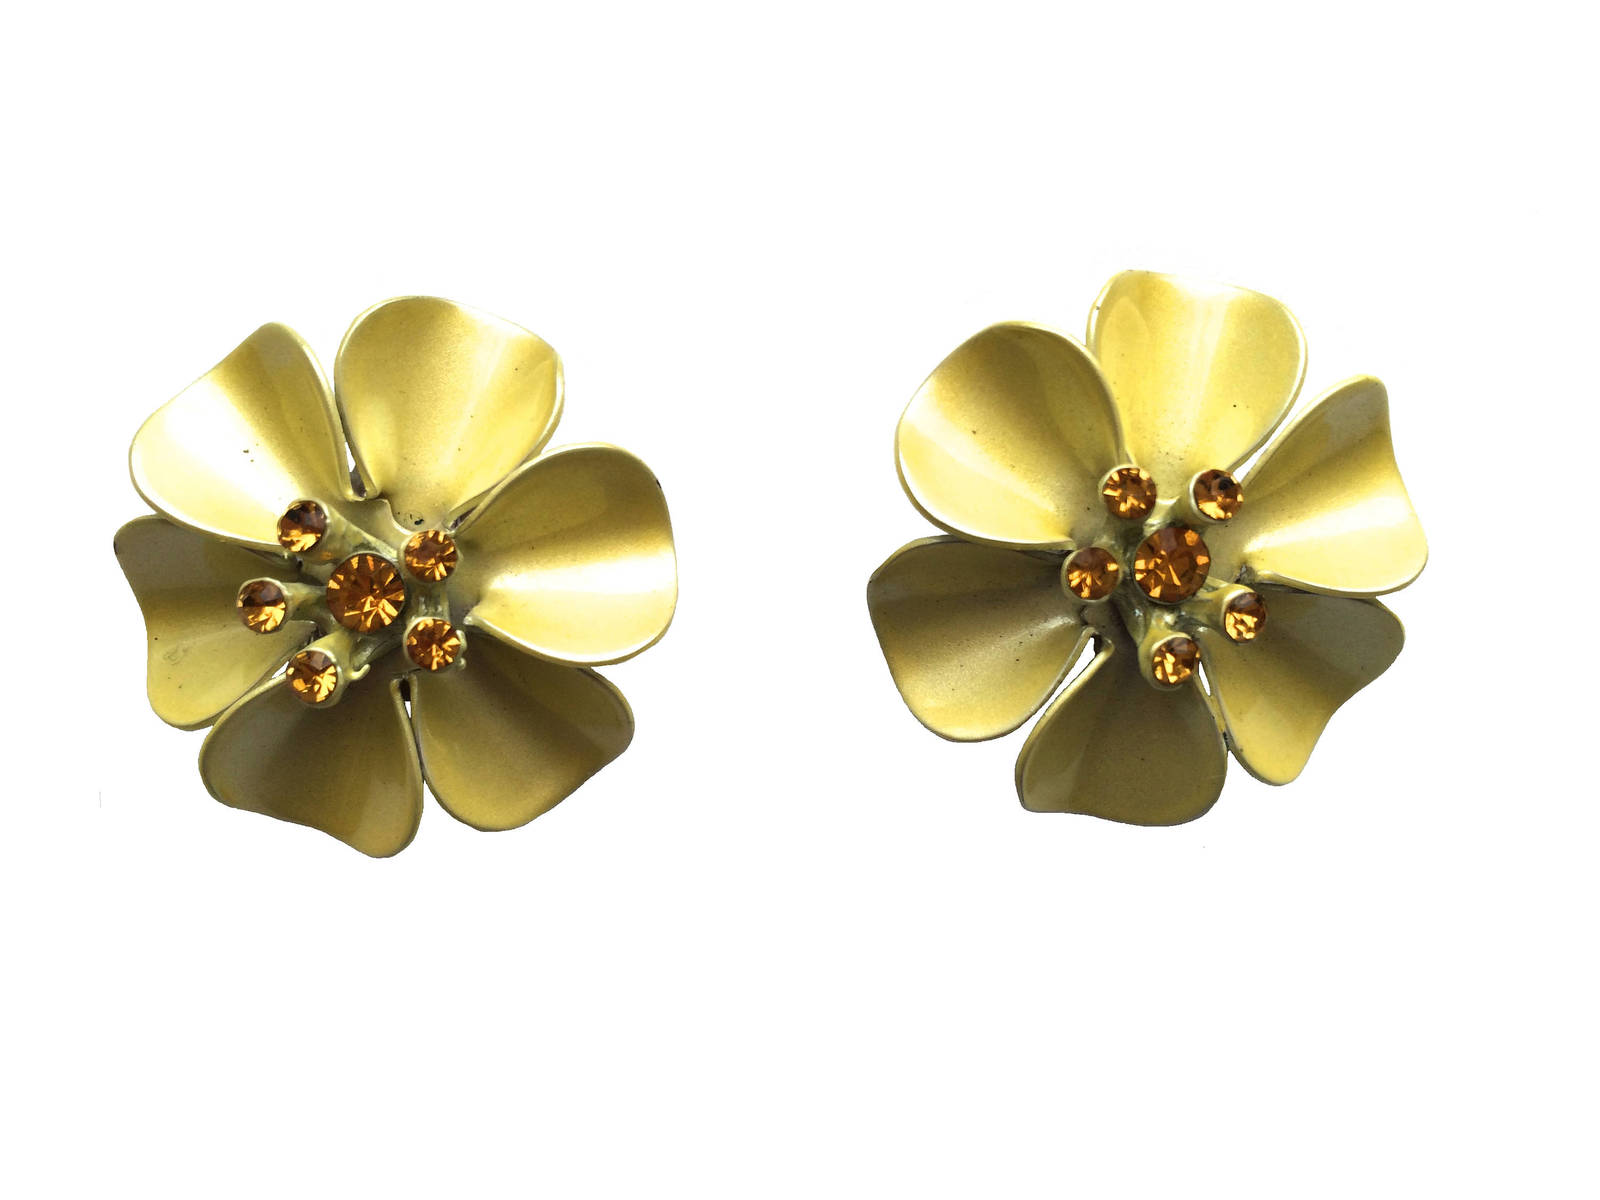 Vintage Pretty Yellow Enamel Orange Rhinestone Flower Clip On Earrings, gift for